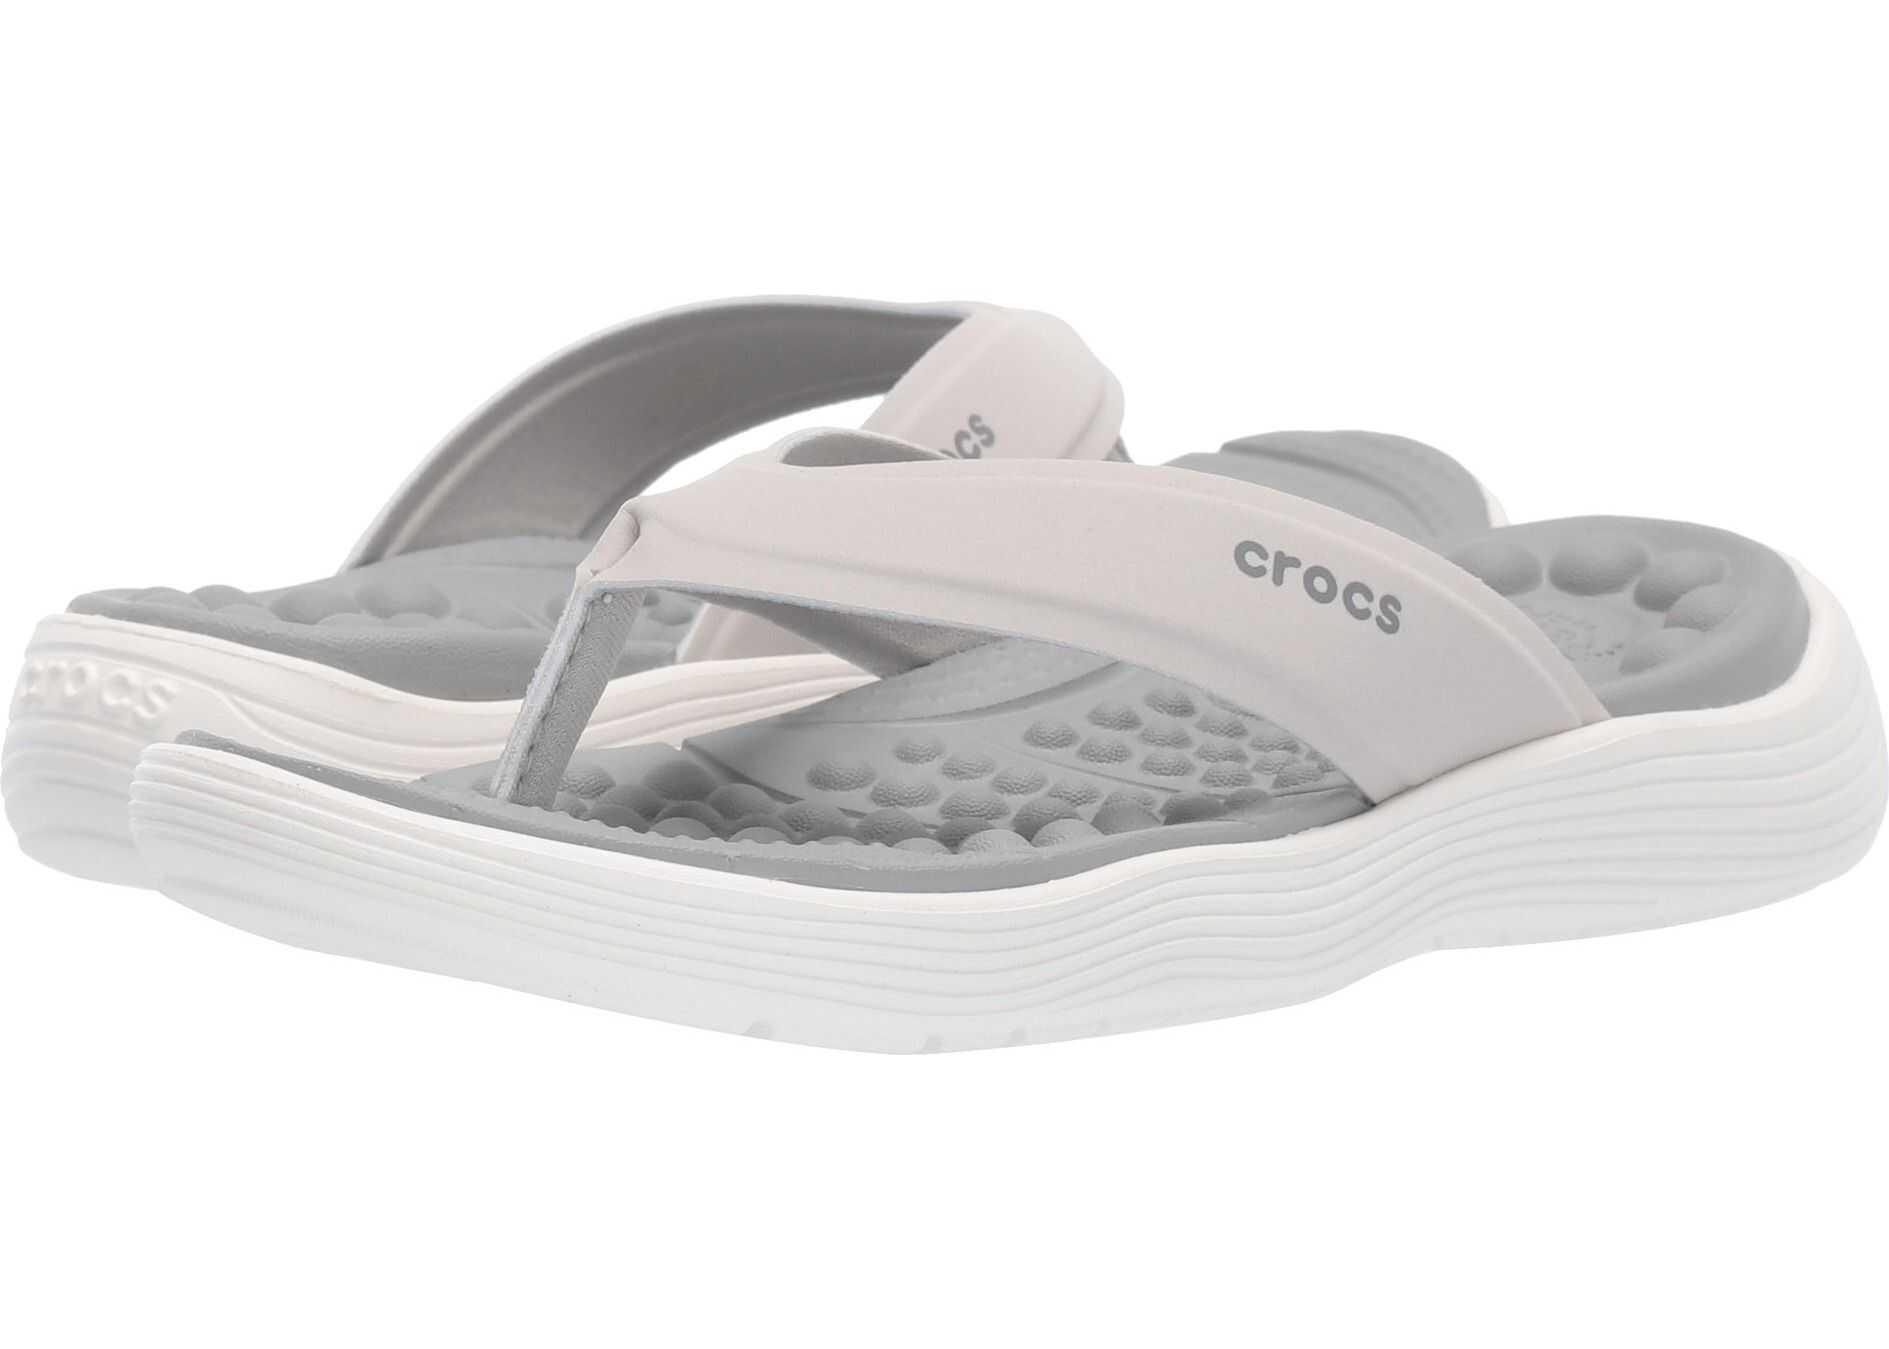 Crocs Reviva Flip Pearl White/Light Grey